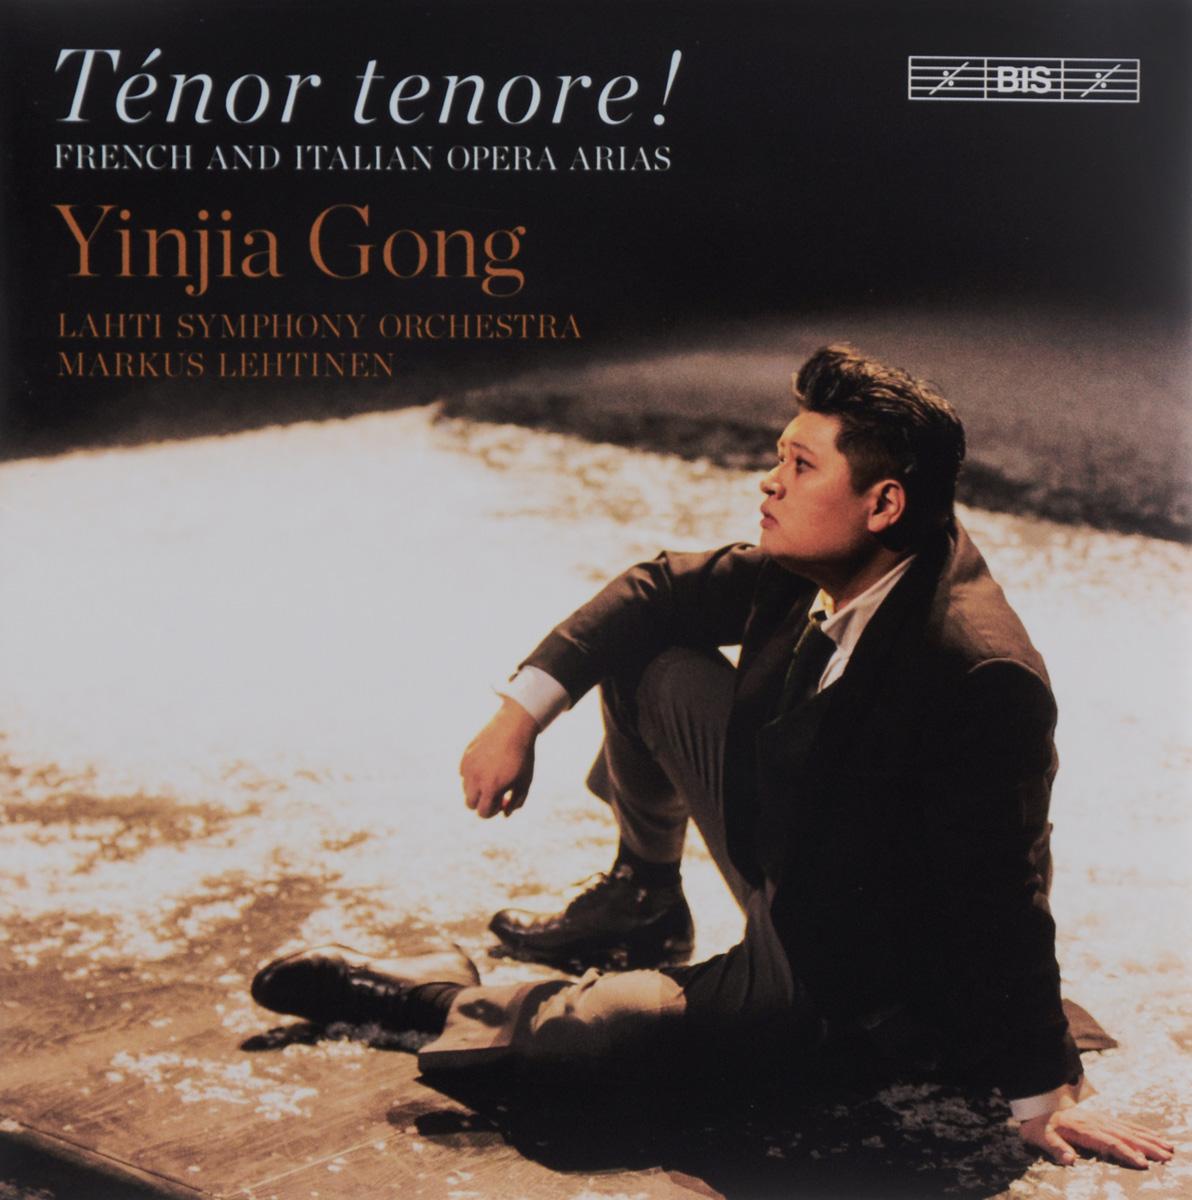 Yinjia Gong,Markus Lehtinen,Lahti Symphony Orchestra Yinjia Gong. Tenor Tenore! French And Italian Arias (SACD) миа перссон miah persson mozart opera and concert arias sacd